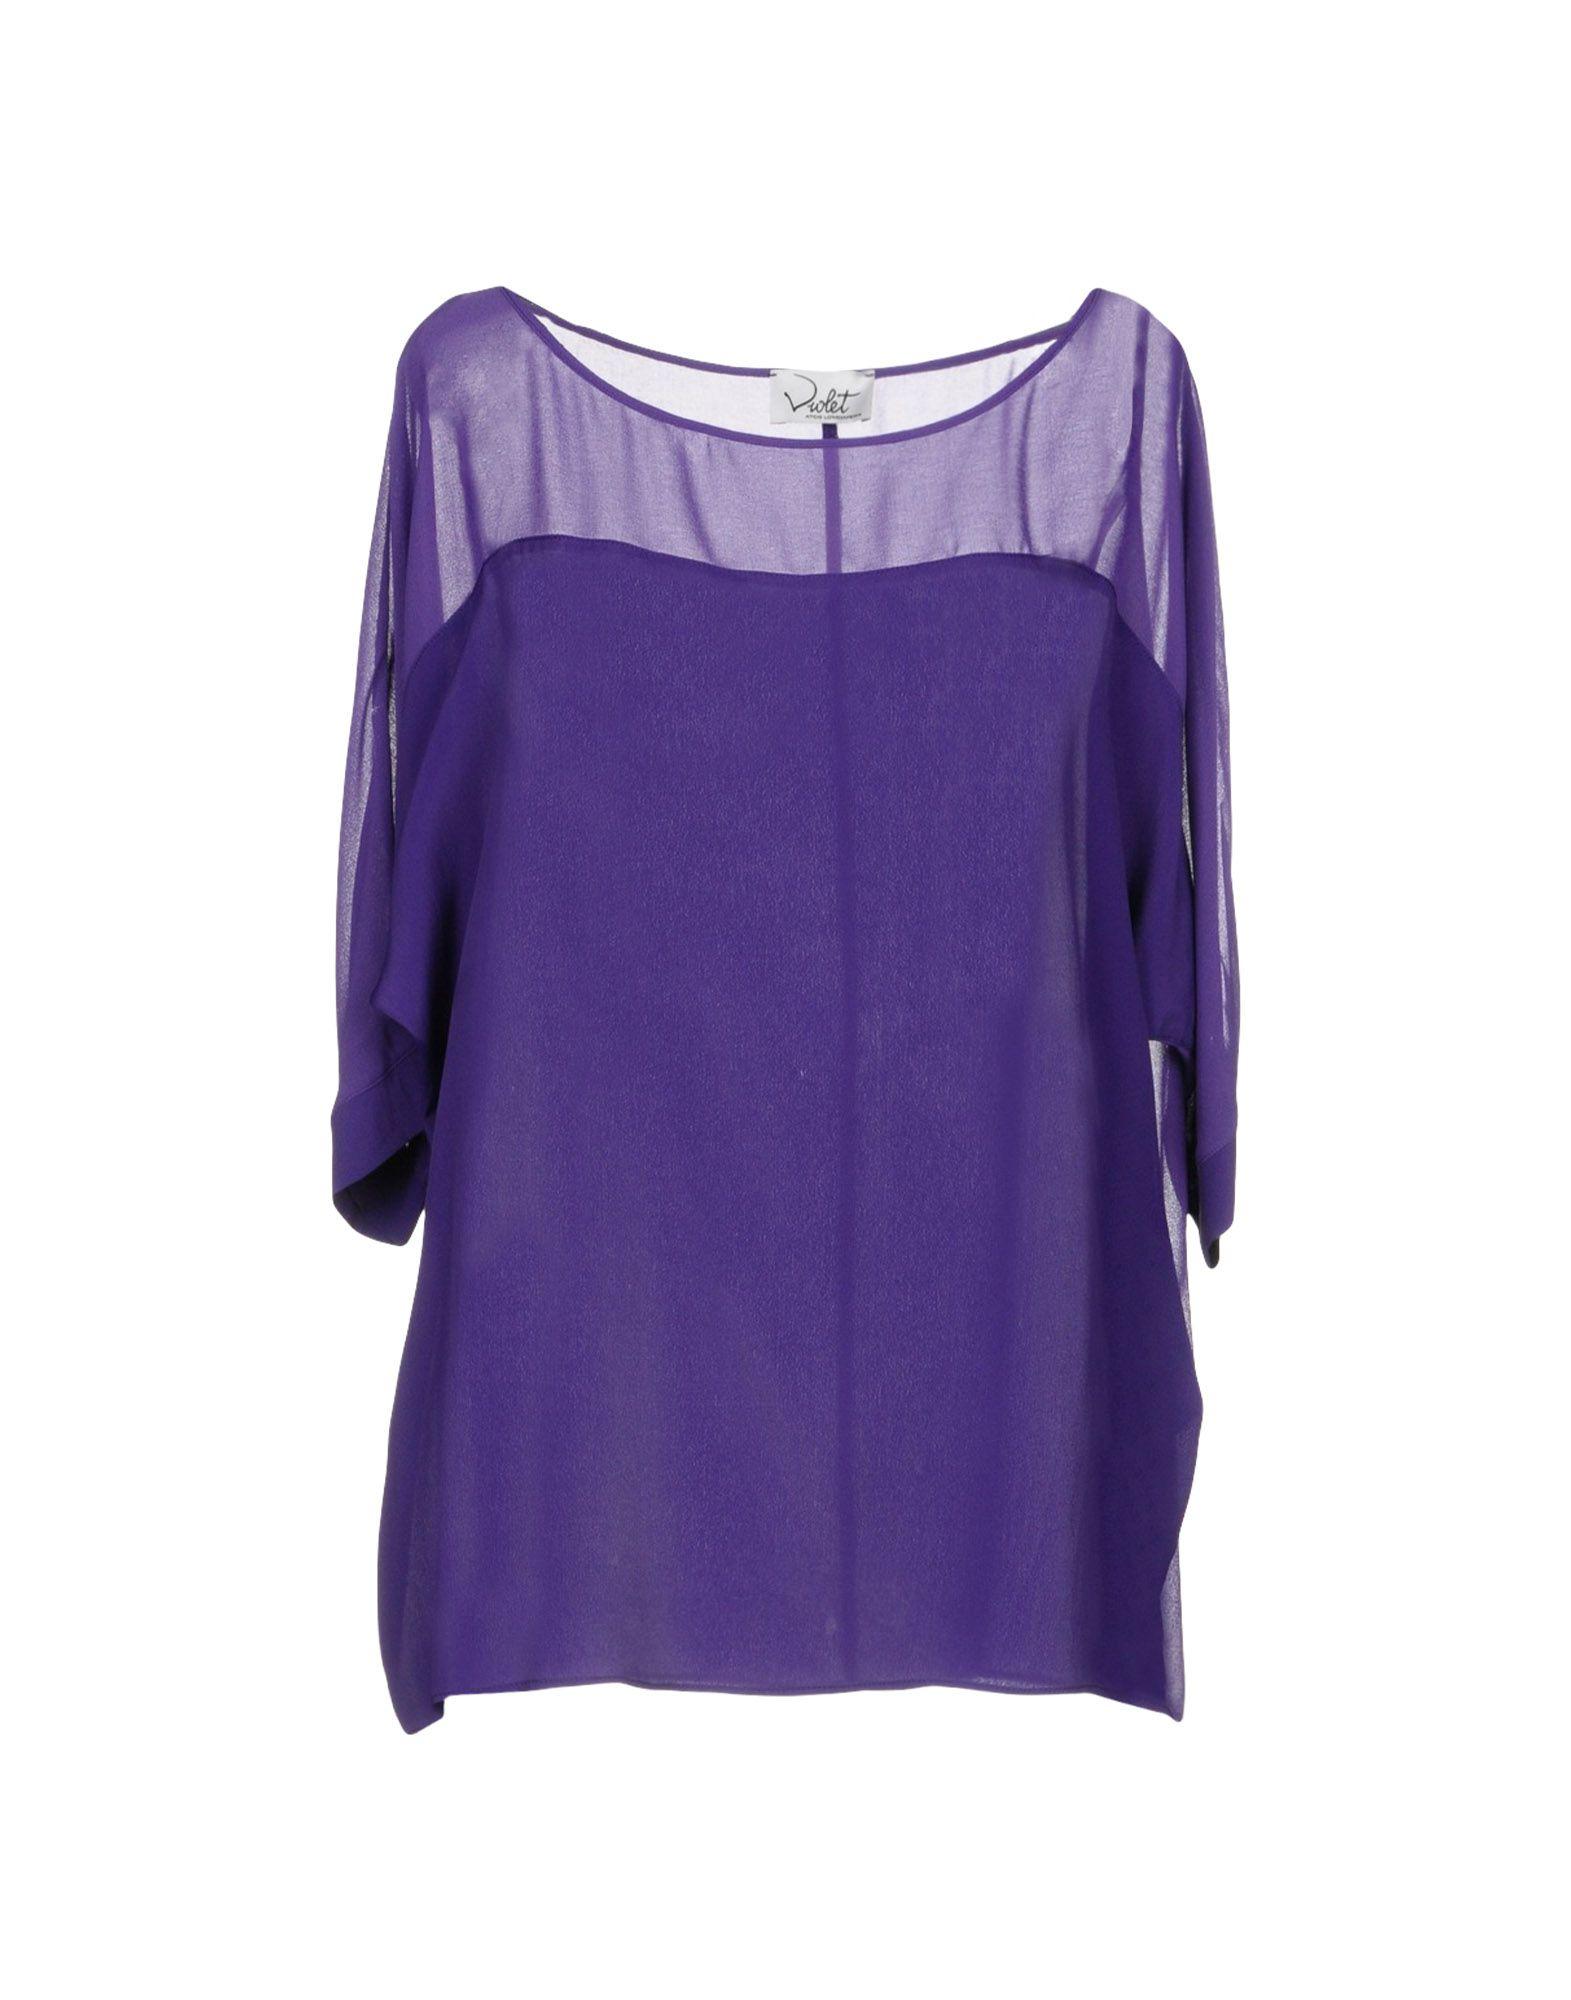 VIOLET ATOS LOMBARDINI Блузка violet atos lombardini блузка